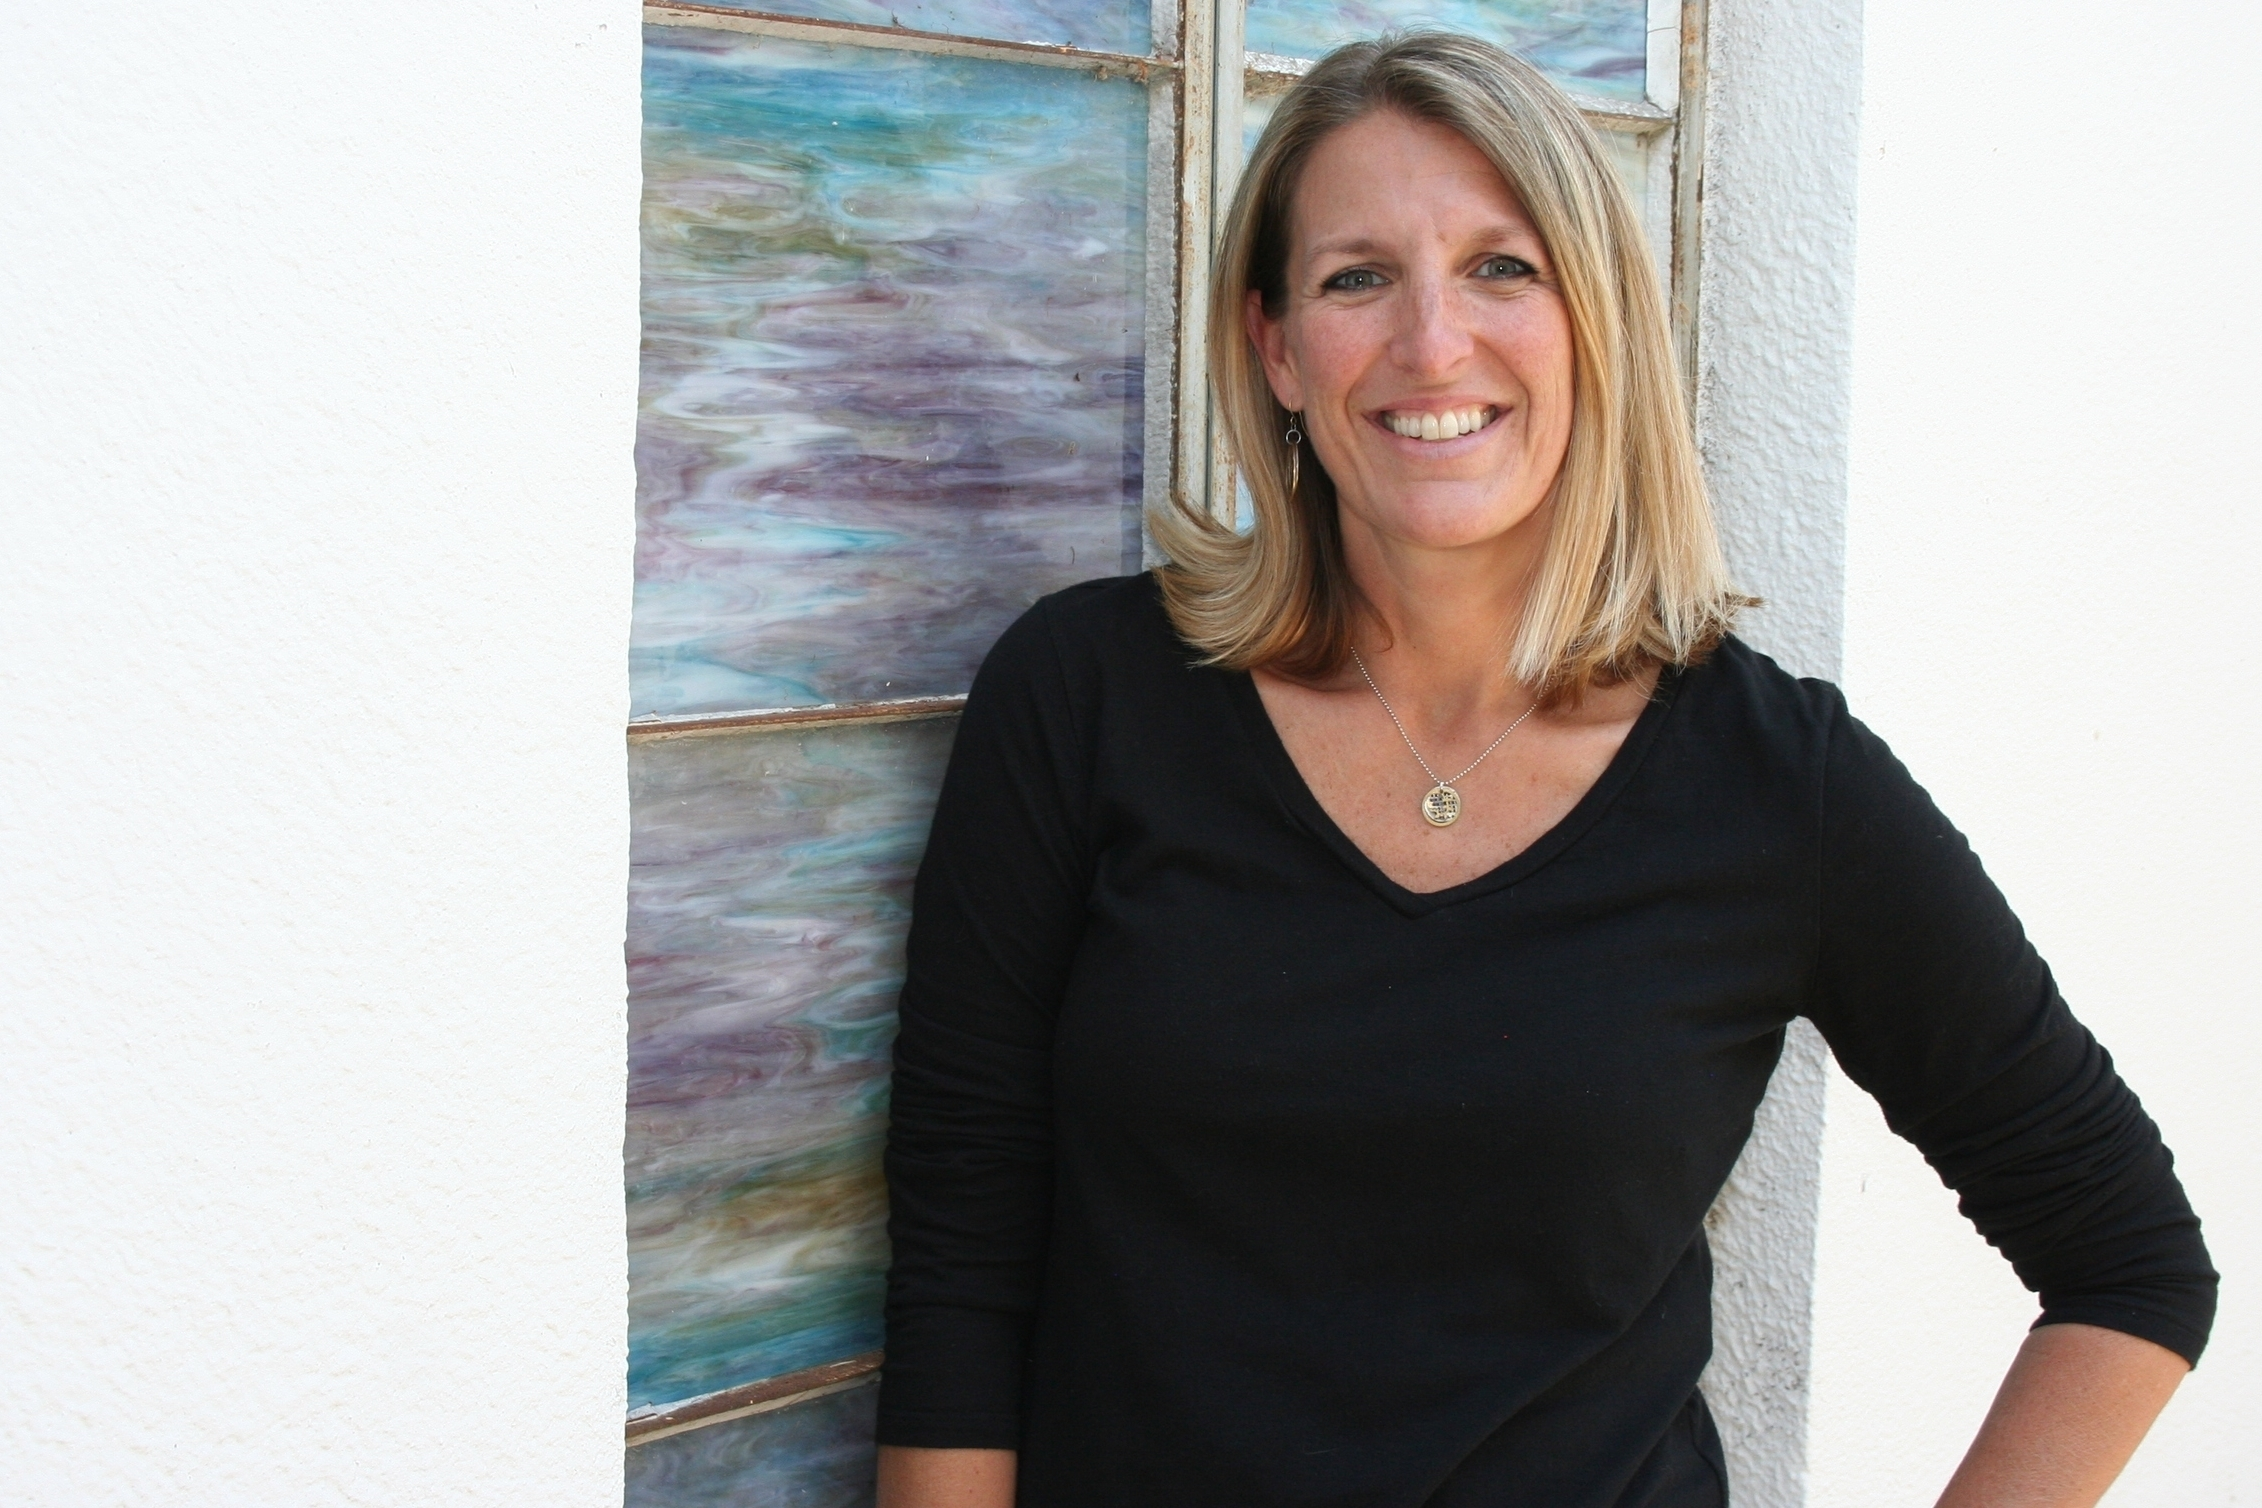 Marisa Stam, Executive Director